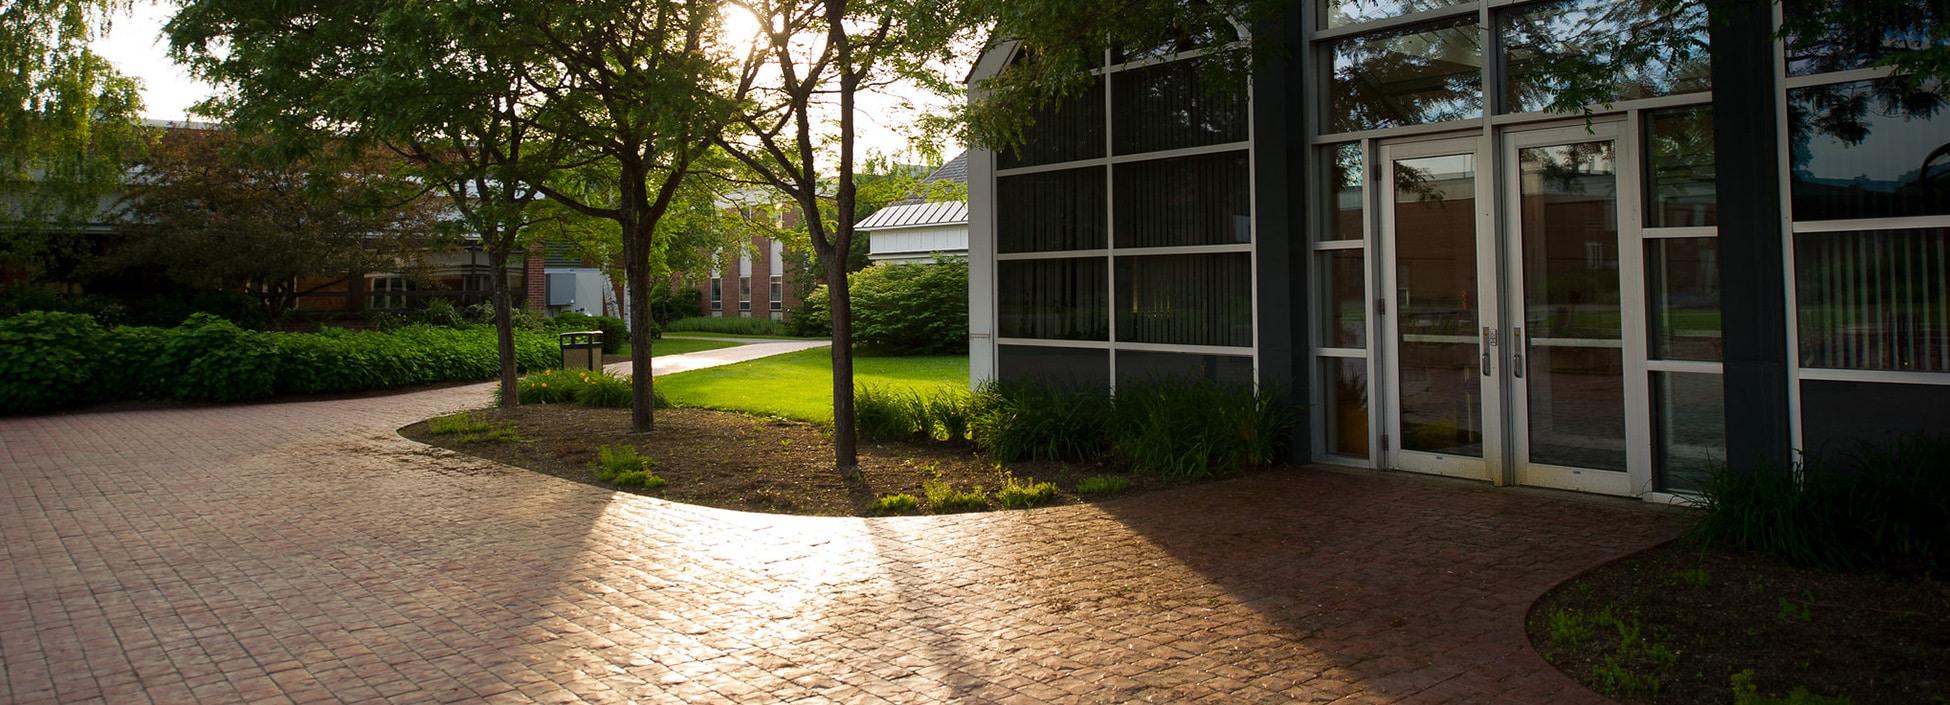 Randolph Center campus, plaza, summer, sunset